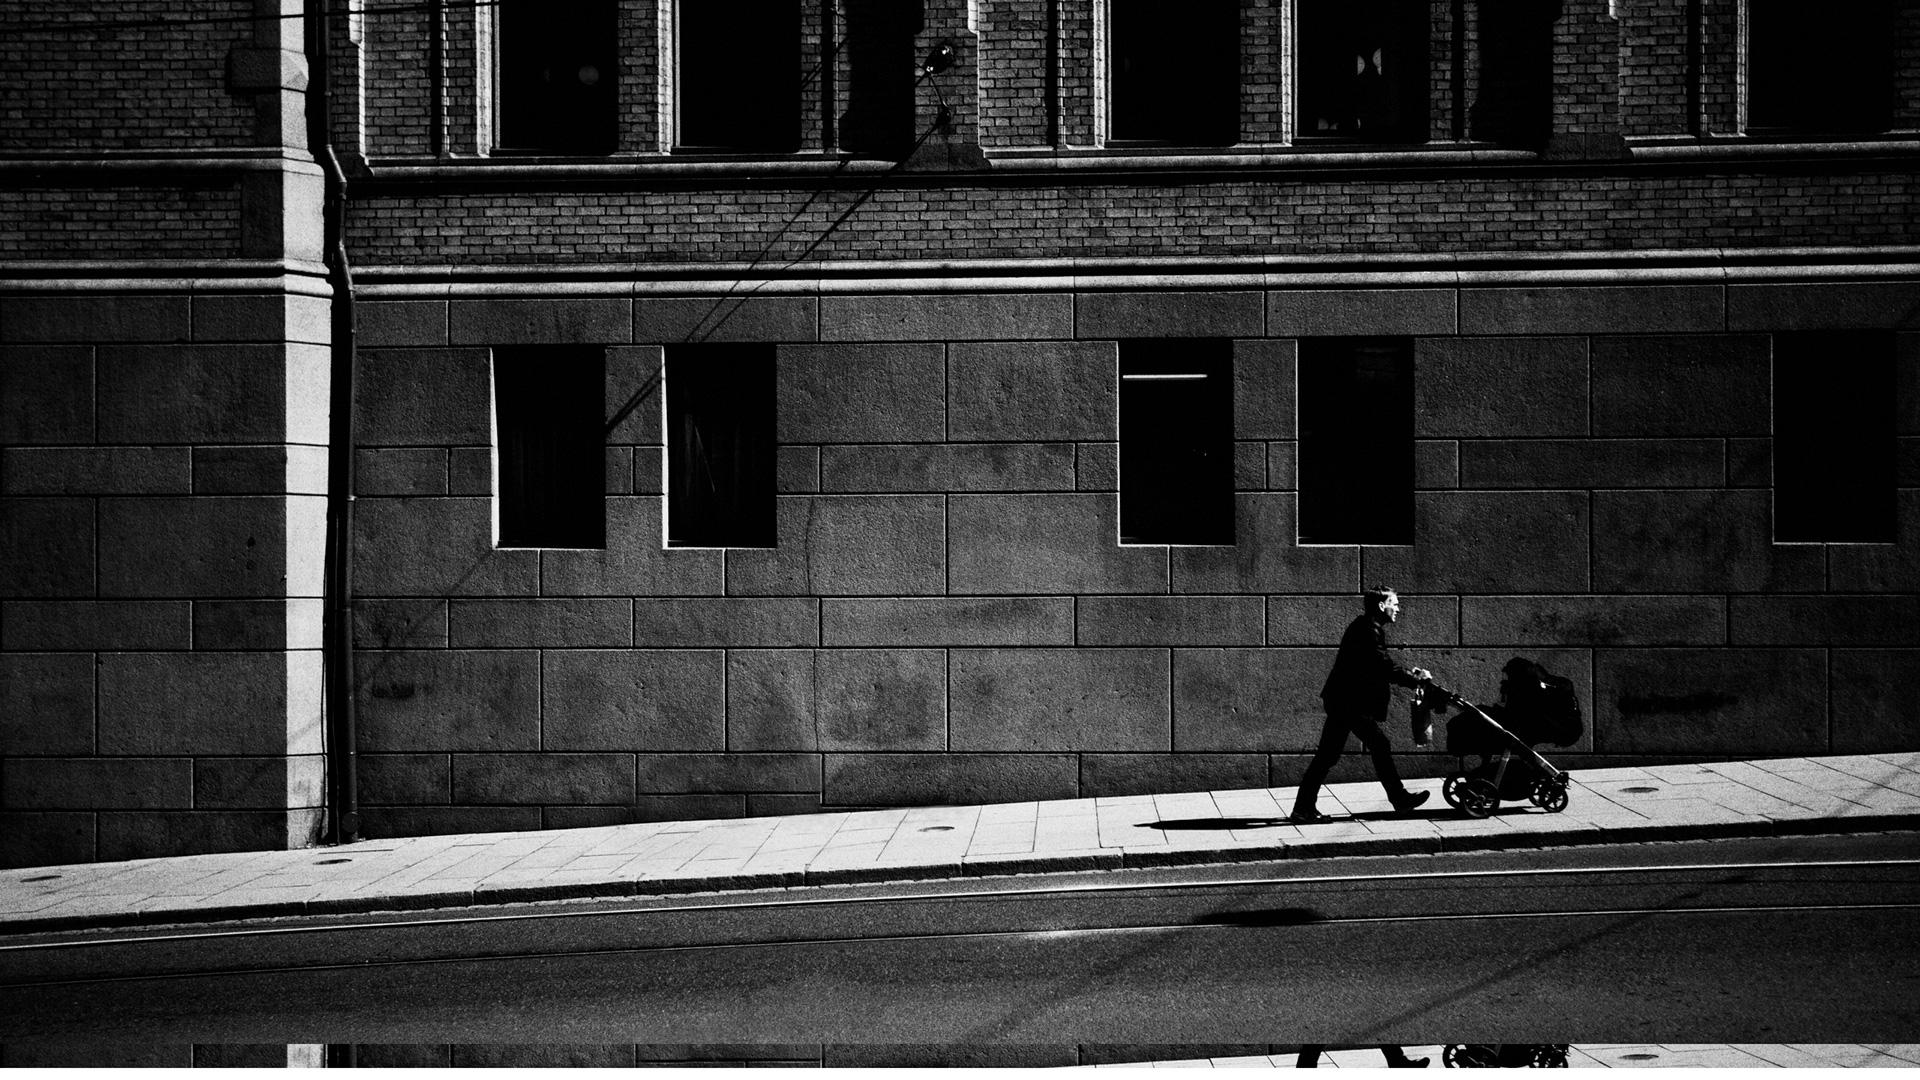 walking_the_baby-wallpaper-2560×1440